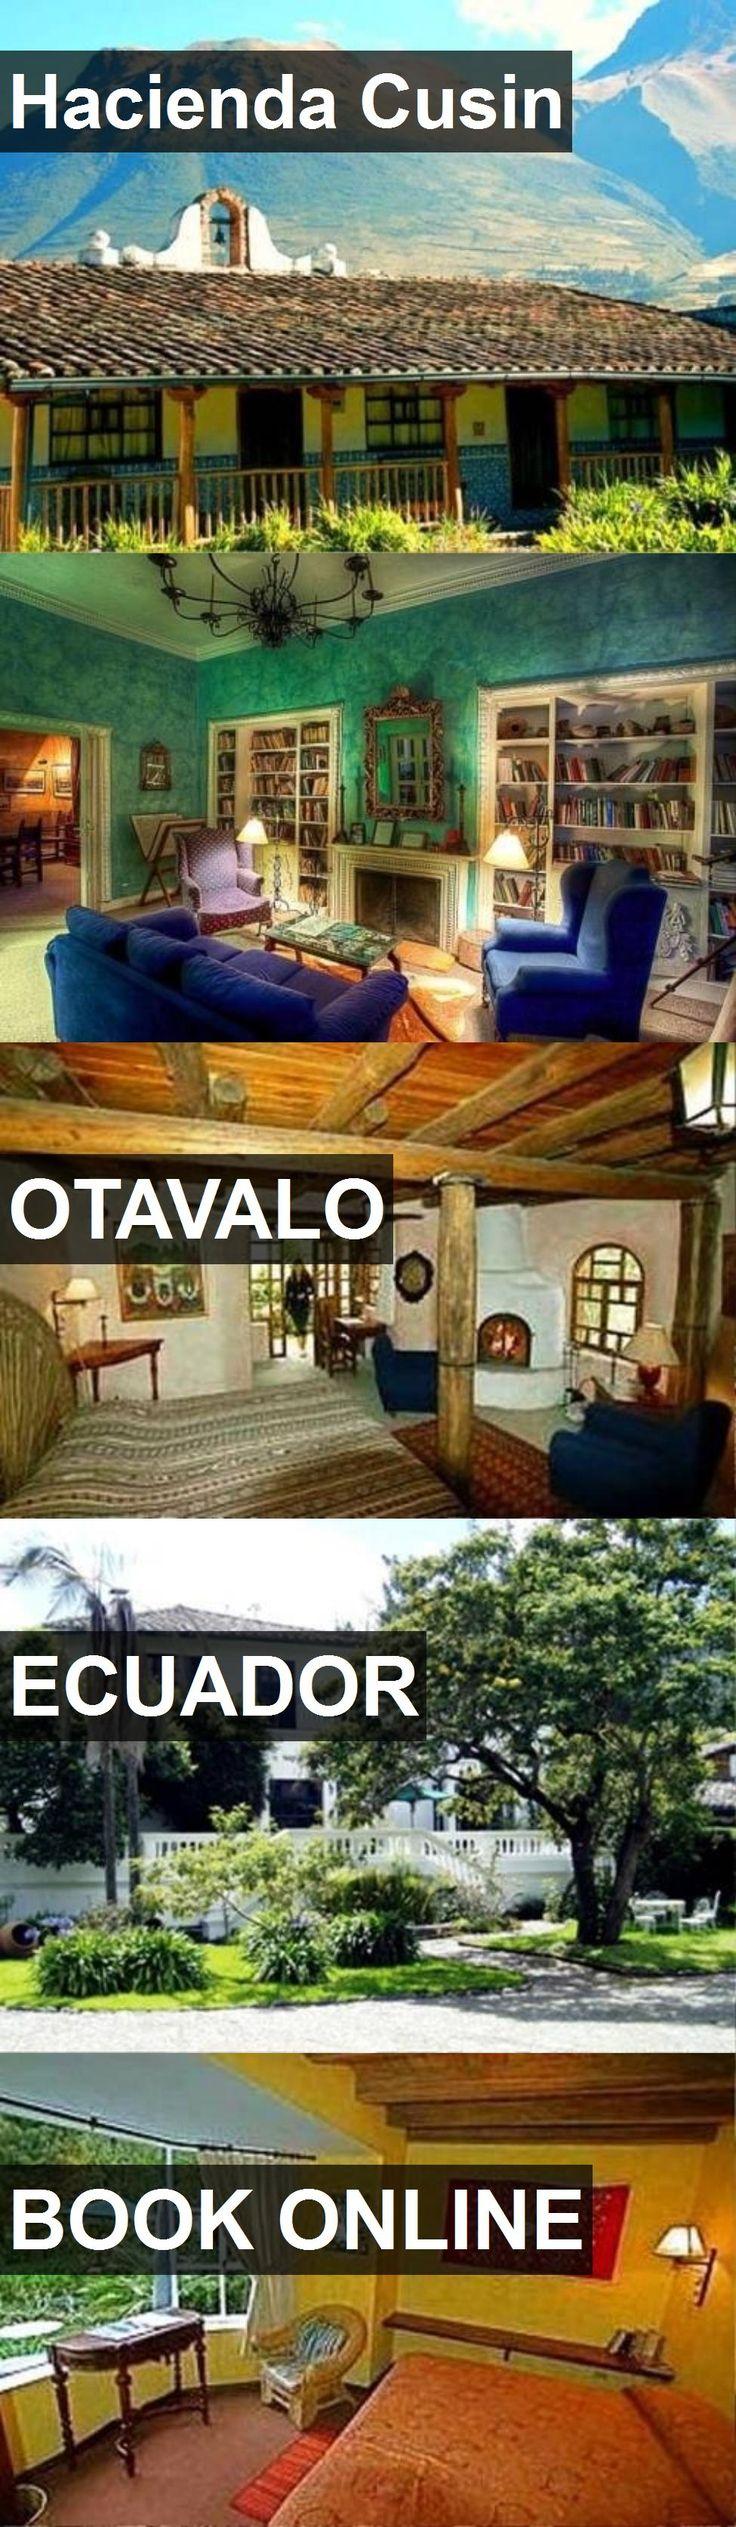 Hotel Hacienda Cusin in Otavalo, Ecuador. For more information, photos, reviews and best prices please follow the link. #Ecuador #Otavalo #travel #vacation #hotel